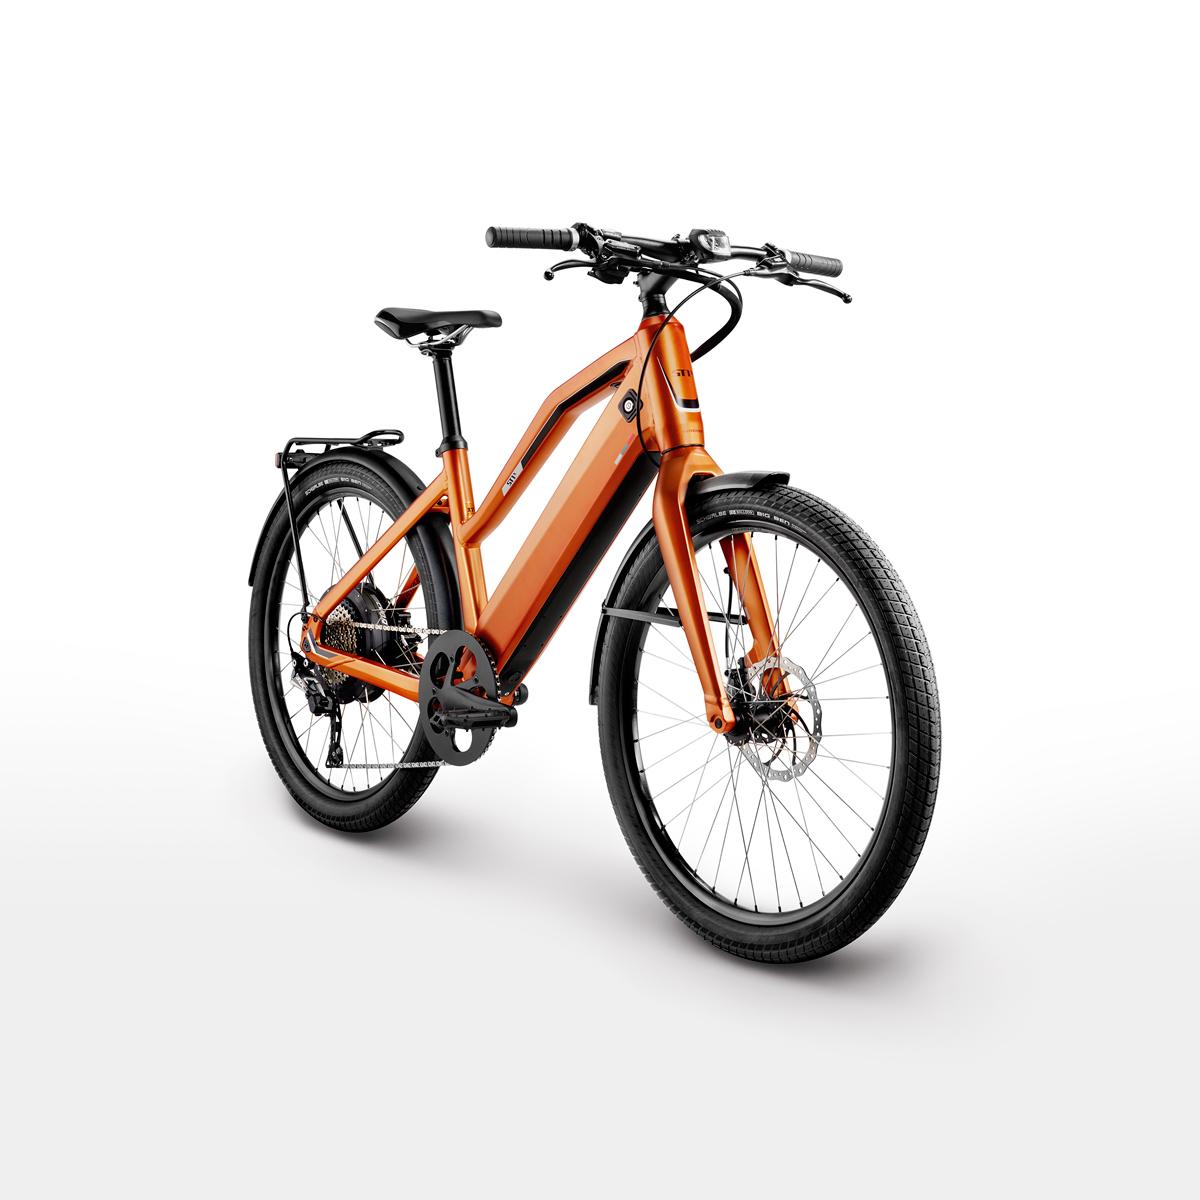 Stromer orange Bike